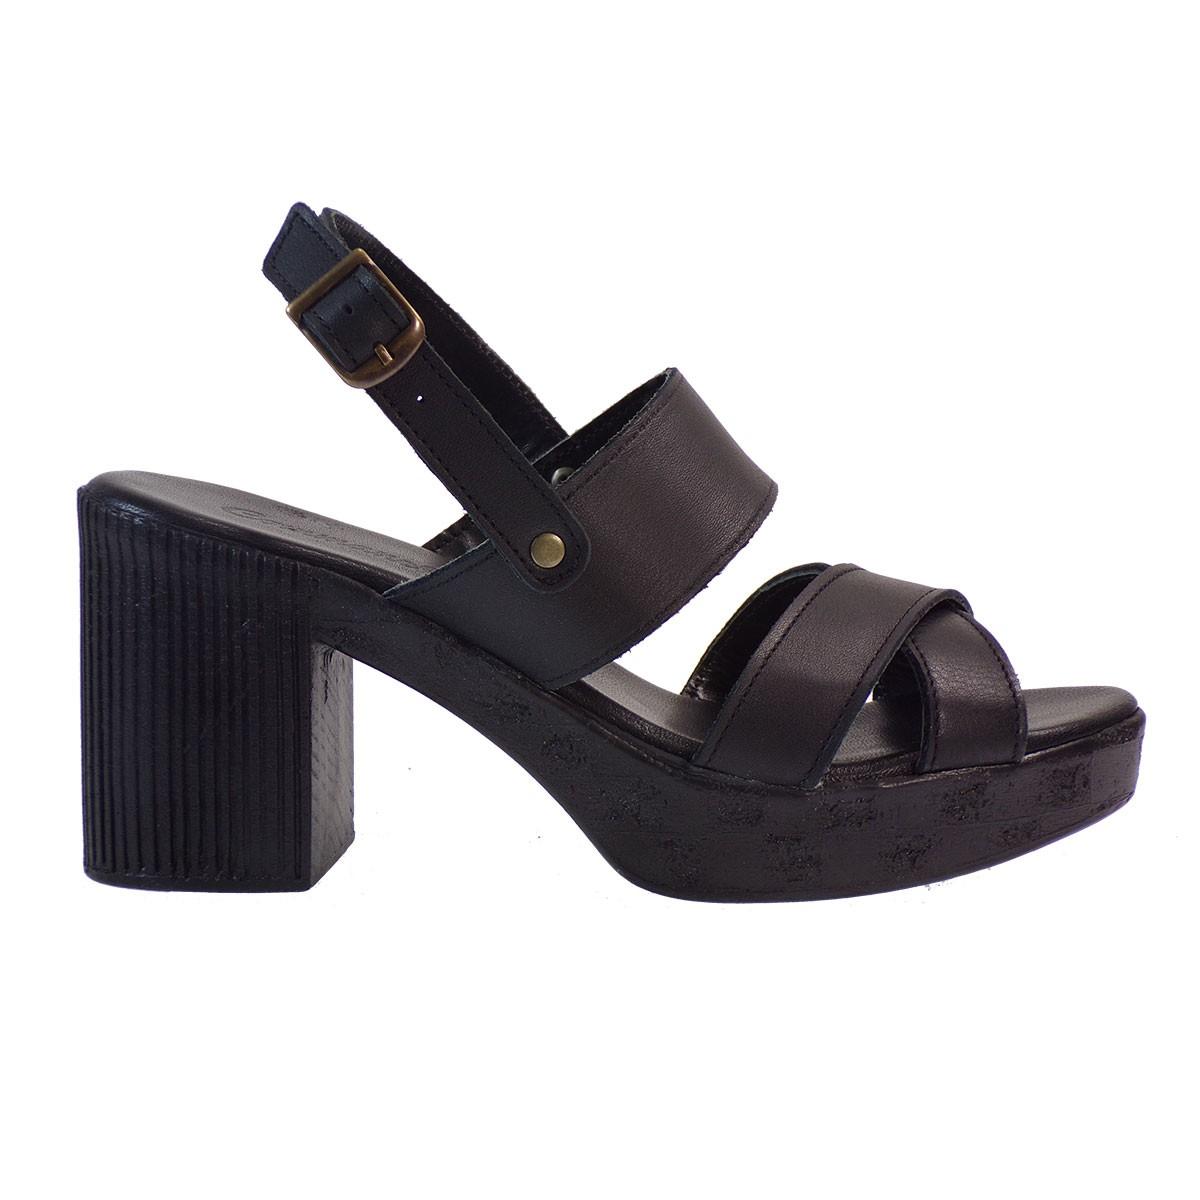 c7154f7799 Commanchero Γυναικεία Πέδιλα 5484 Μαύρο Δέρμα – IShoeStore